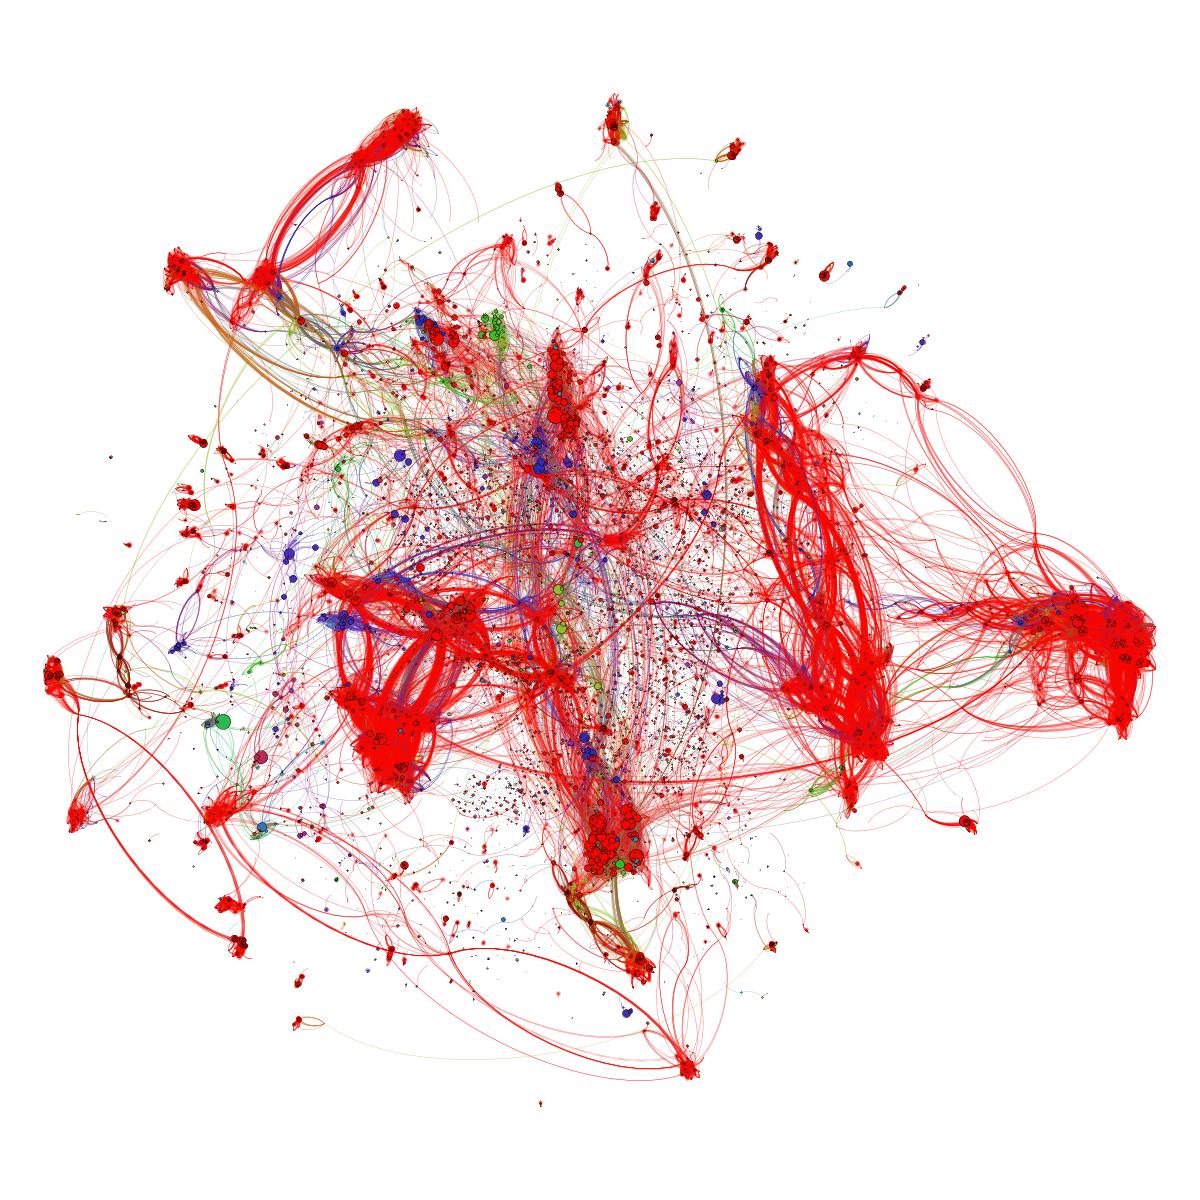 machine learning economics